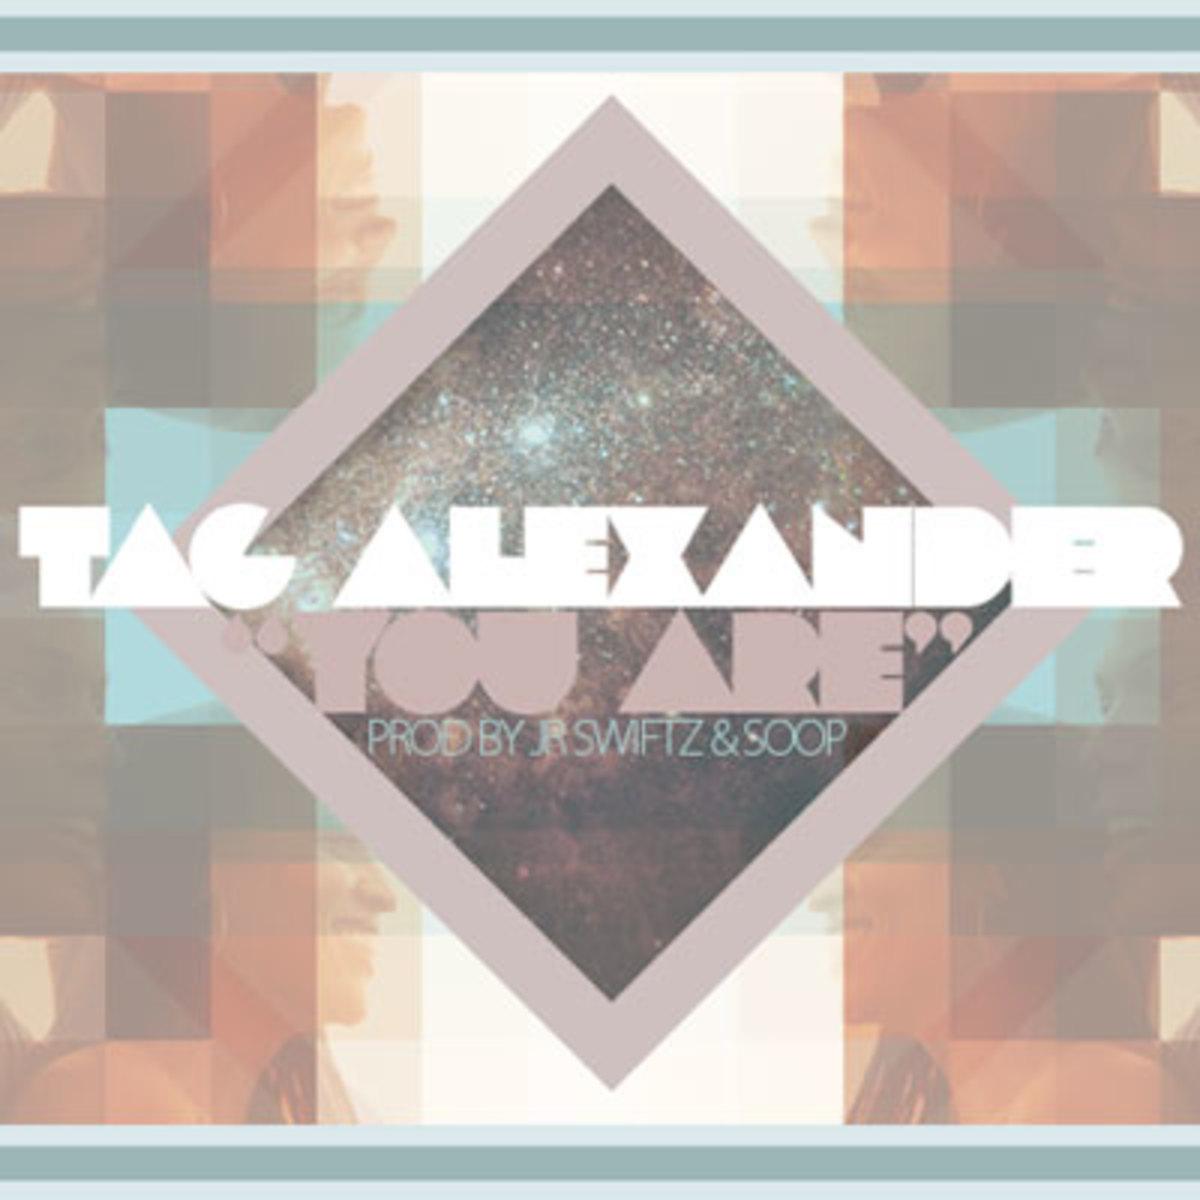 tagalexander-youare.jpg